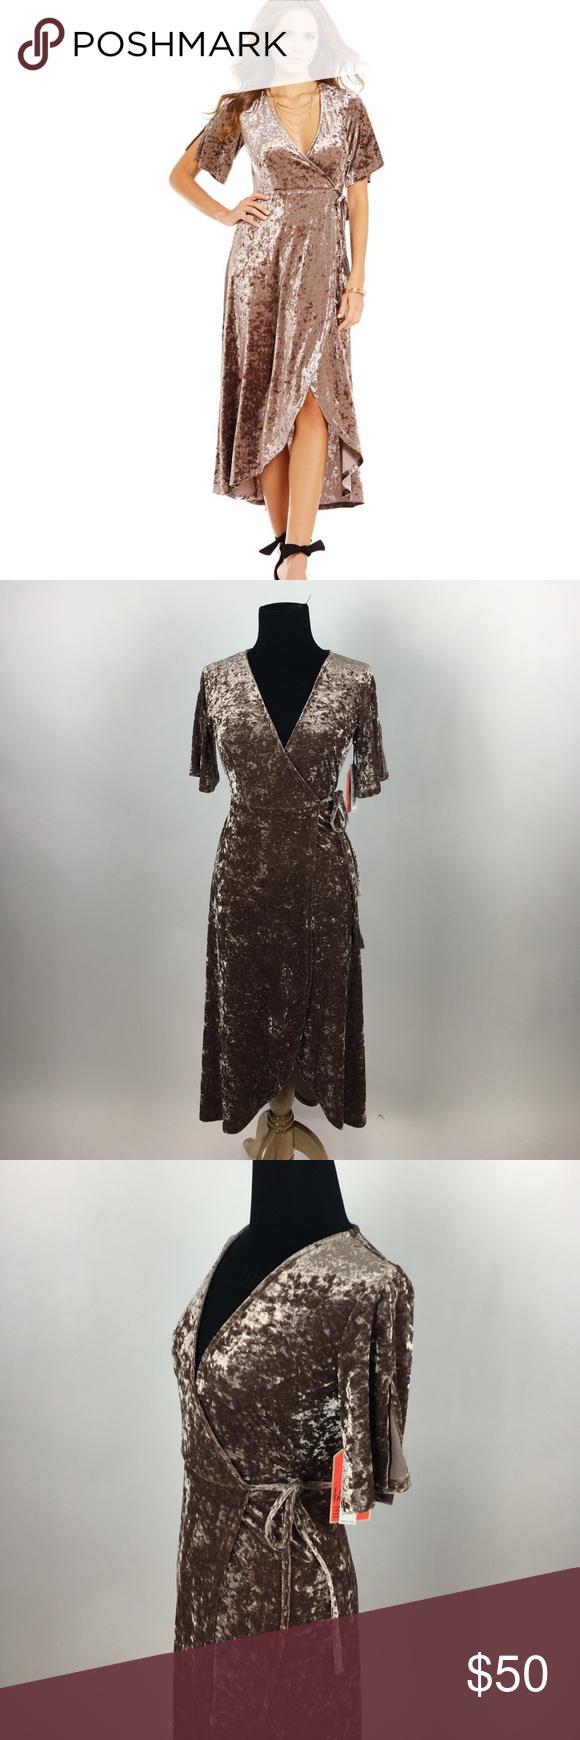 fbf615e41e Gianni Bini Marche Dress Velvet Wrap Dress From Gianni Bini